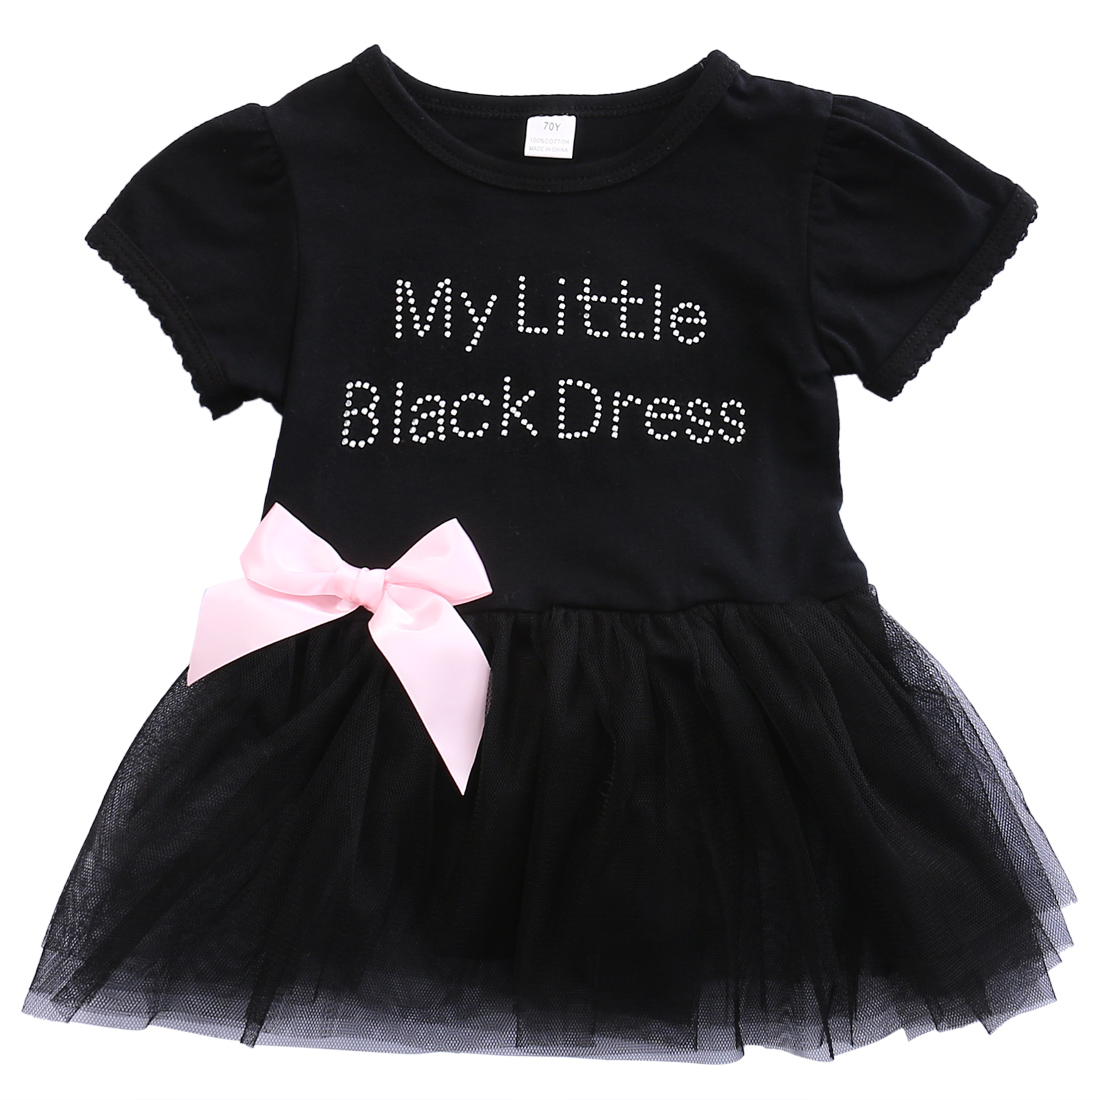 c9e1077a66b608 Mijn Kleine Zwarte Jurk Baby Baby Meisjes Korte Mouwen Tutu Jurk Lace Strik  Mini Feestjurk in Mijn Kleine Zwarte Jurk Baby Baby Meisjes Korte Mouwen  Tutu ...